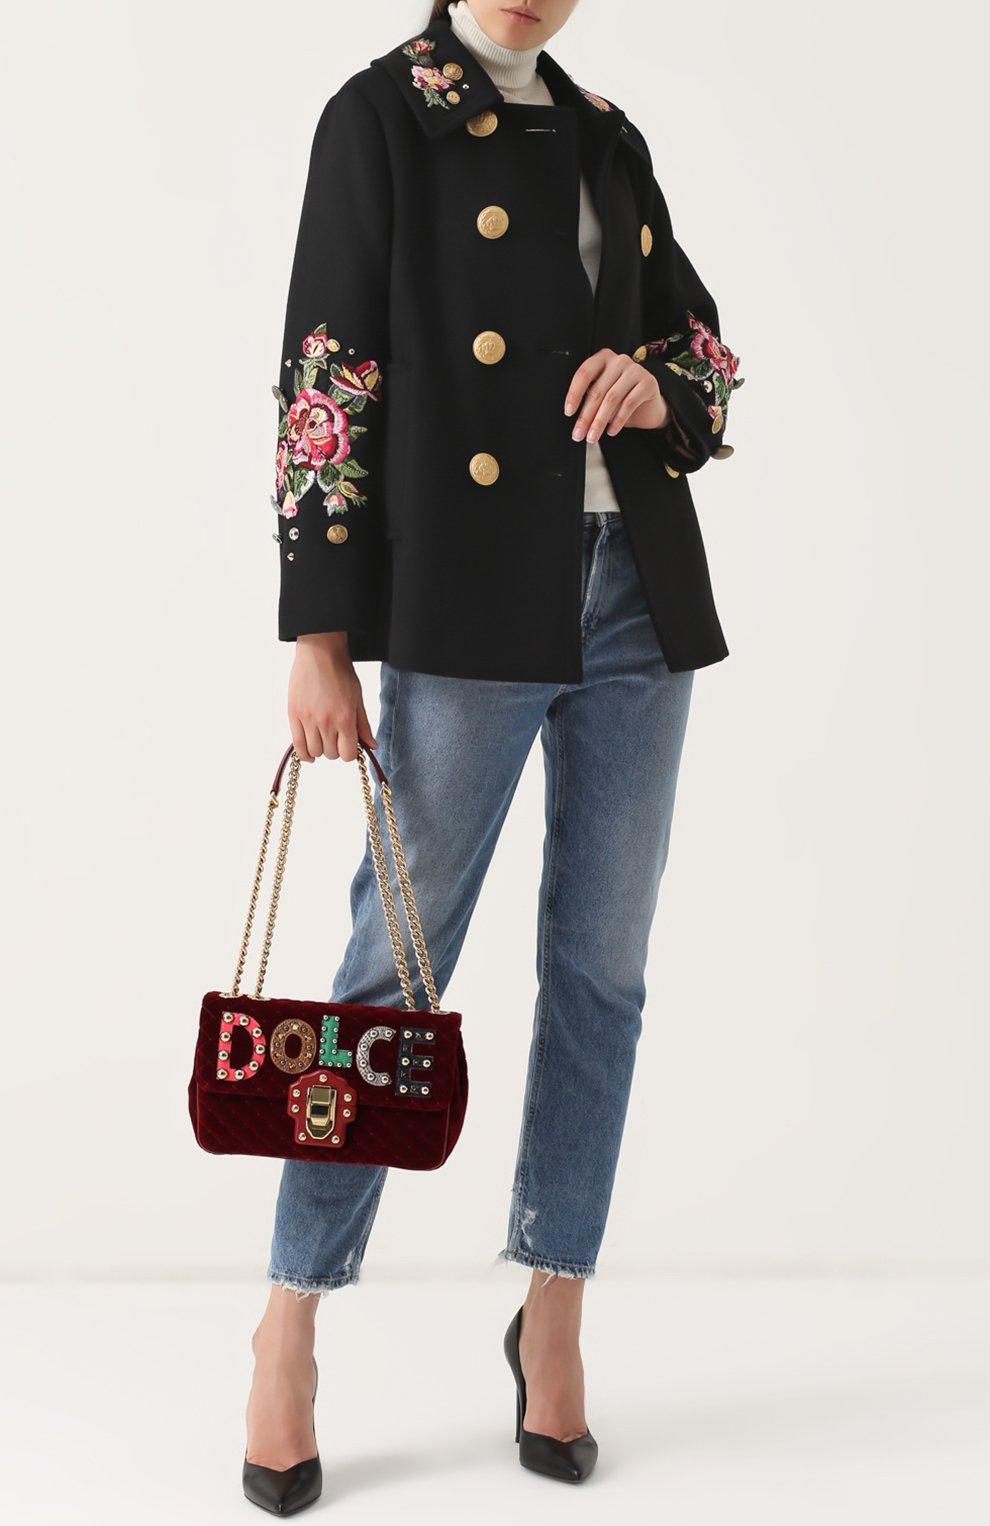 Сумка Lucia с аппликациями Dolce & Gabbana бордовая цвета   Фото №2